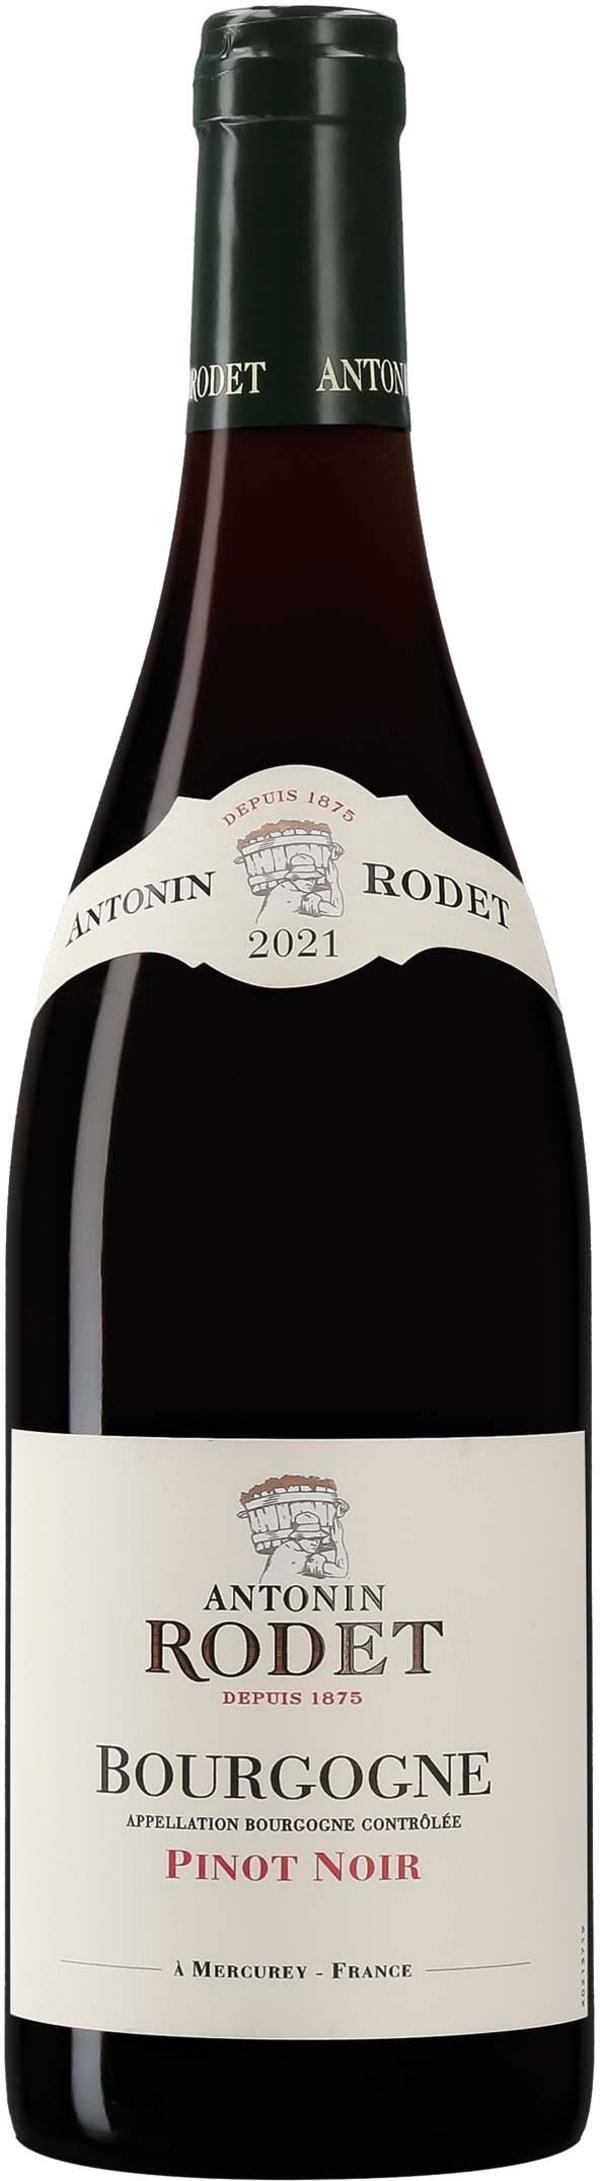 Antonin Rodet Pinot Noir 2019